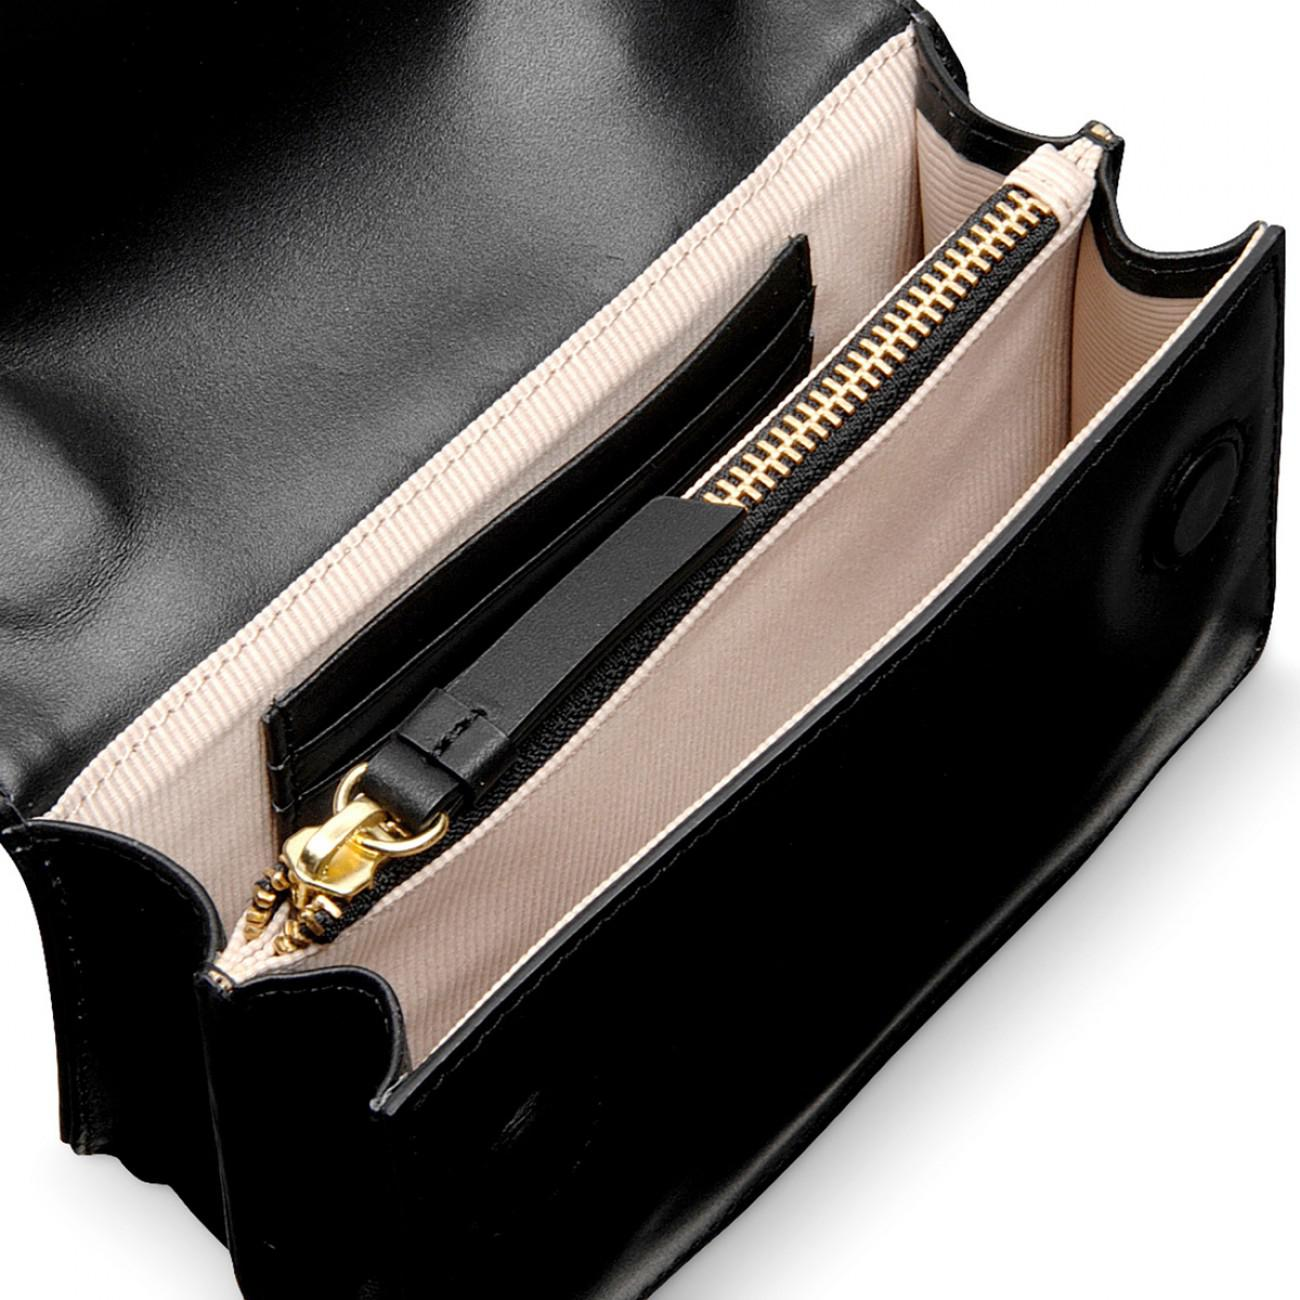 1e91984ba9 Radley Godolphin House Mini Flapover Cross Body Bag in Black - Lyst